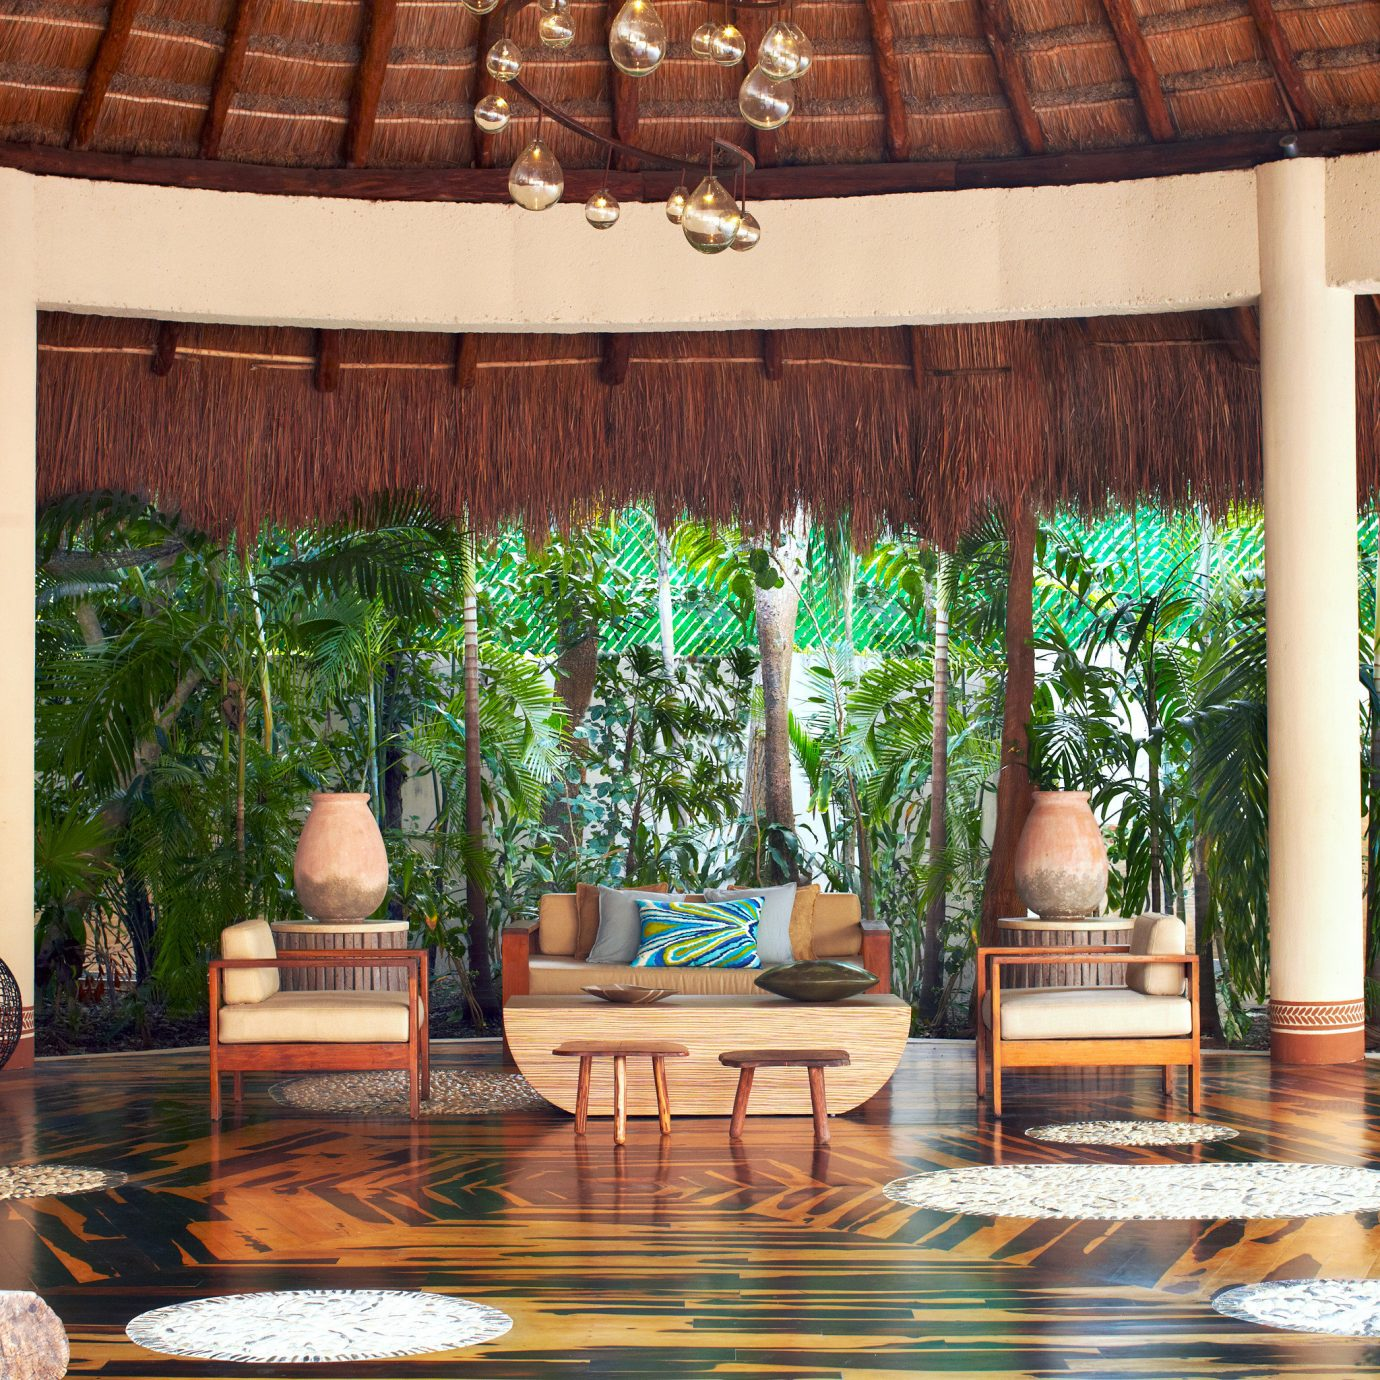 Elegant Lounge Outdoors Patio Romantic Tropical backyard outdoor structure home porch Courtyard living room Garden